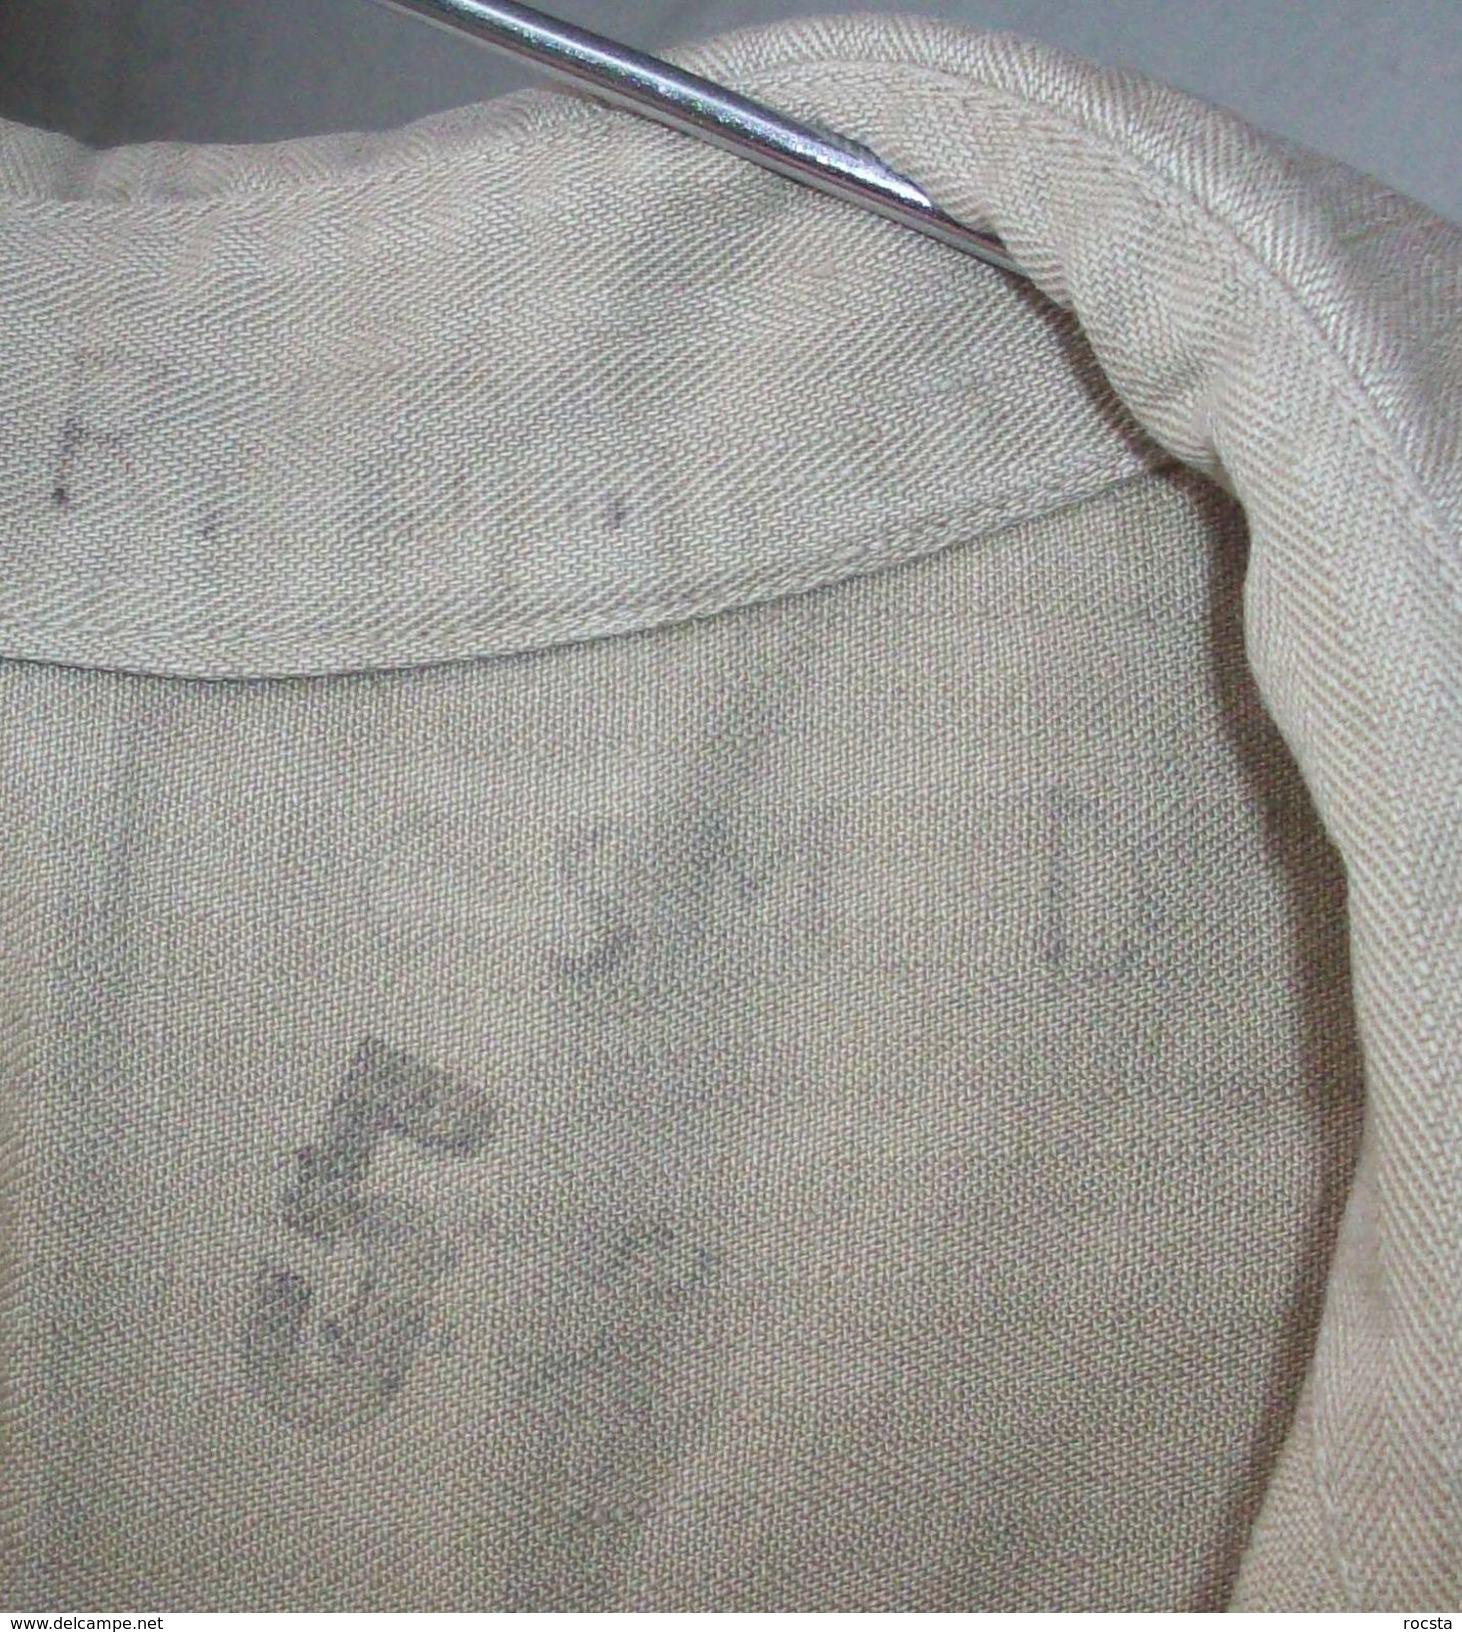 British Army Khaki Cotton Drill Tunic - Uniform